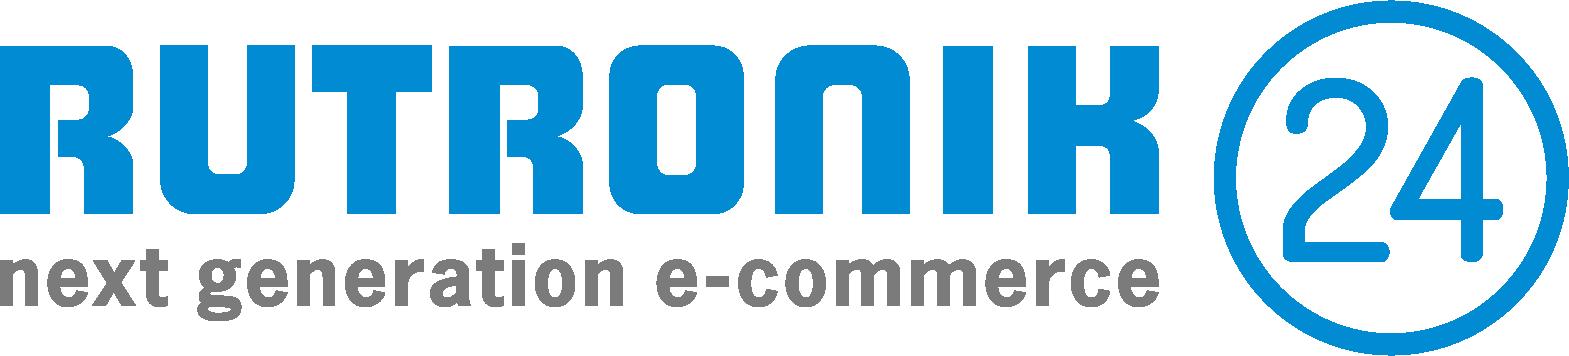 partner logo distributor rutronik